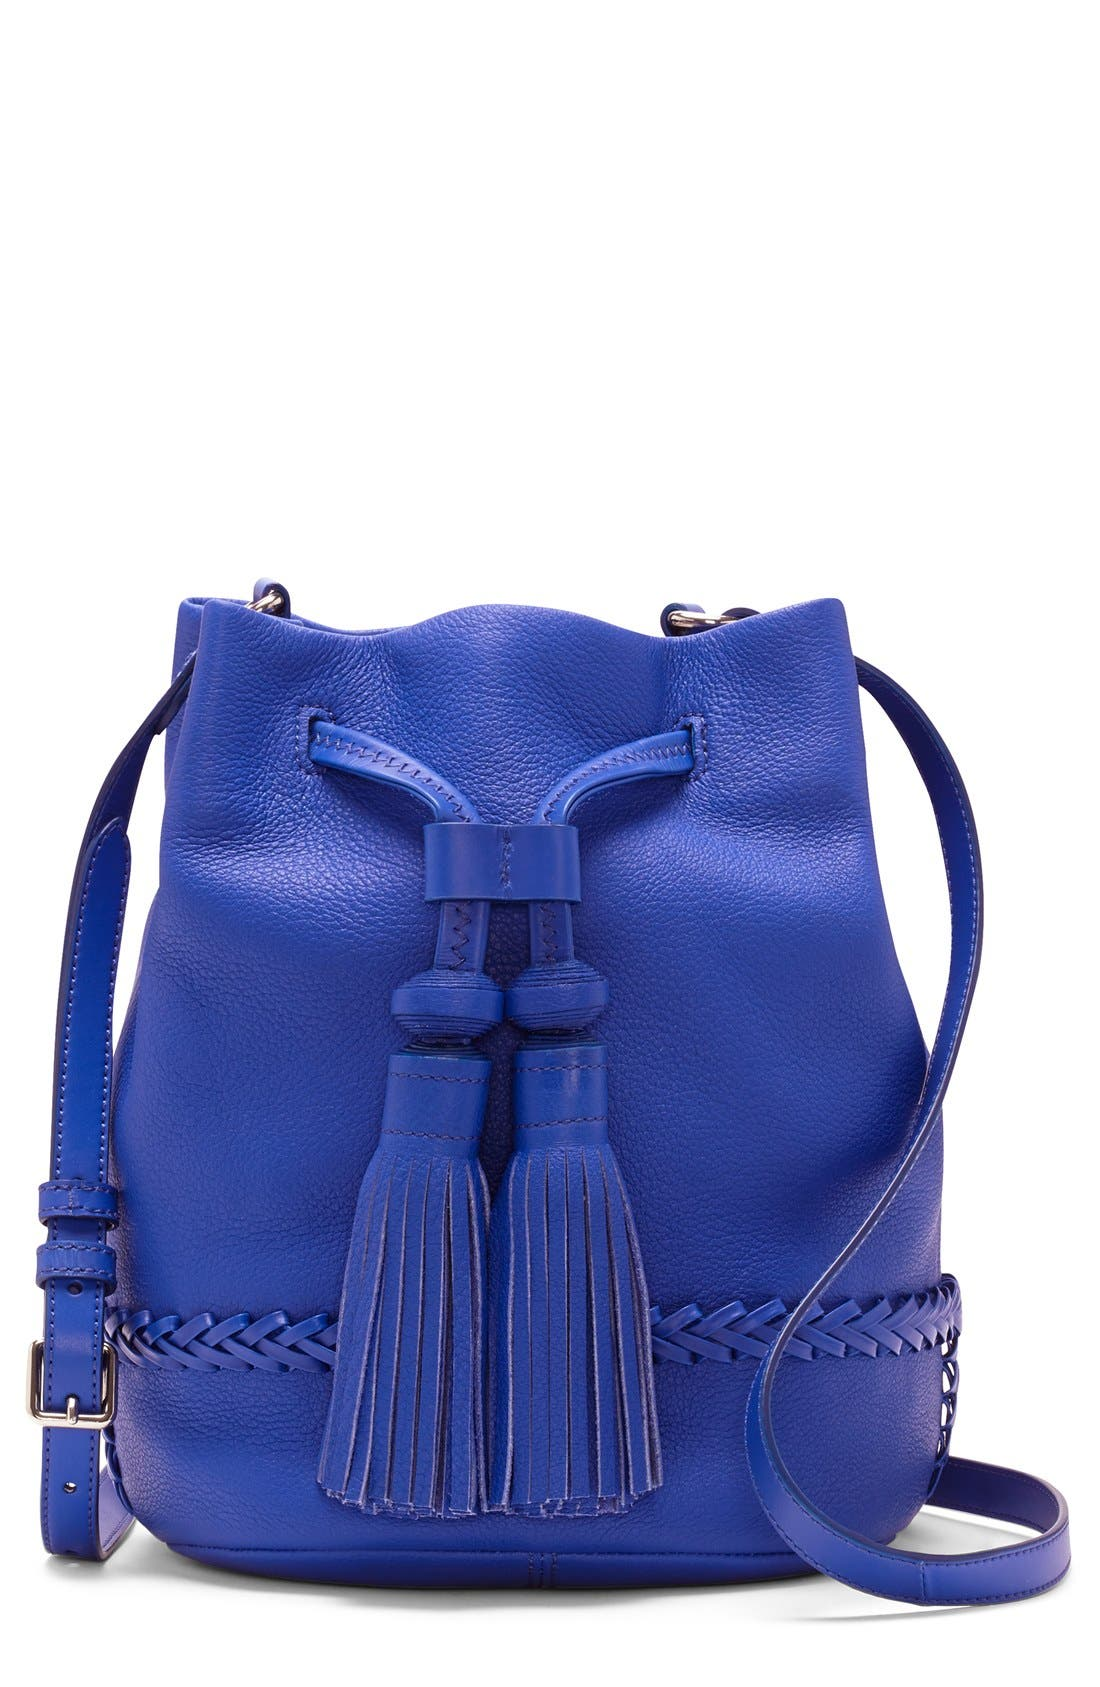 Main Image - Vince Camuto 'Leigh' Leather Crossbody Bag